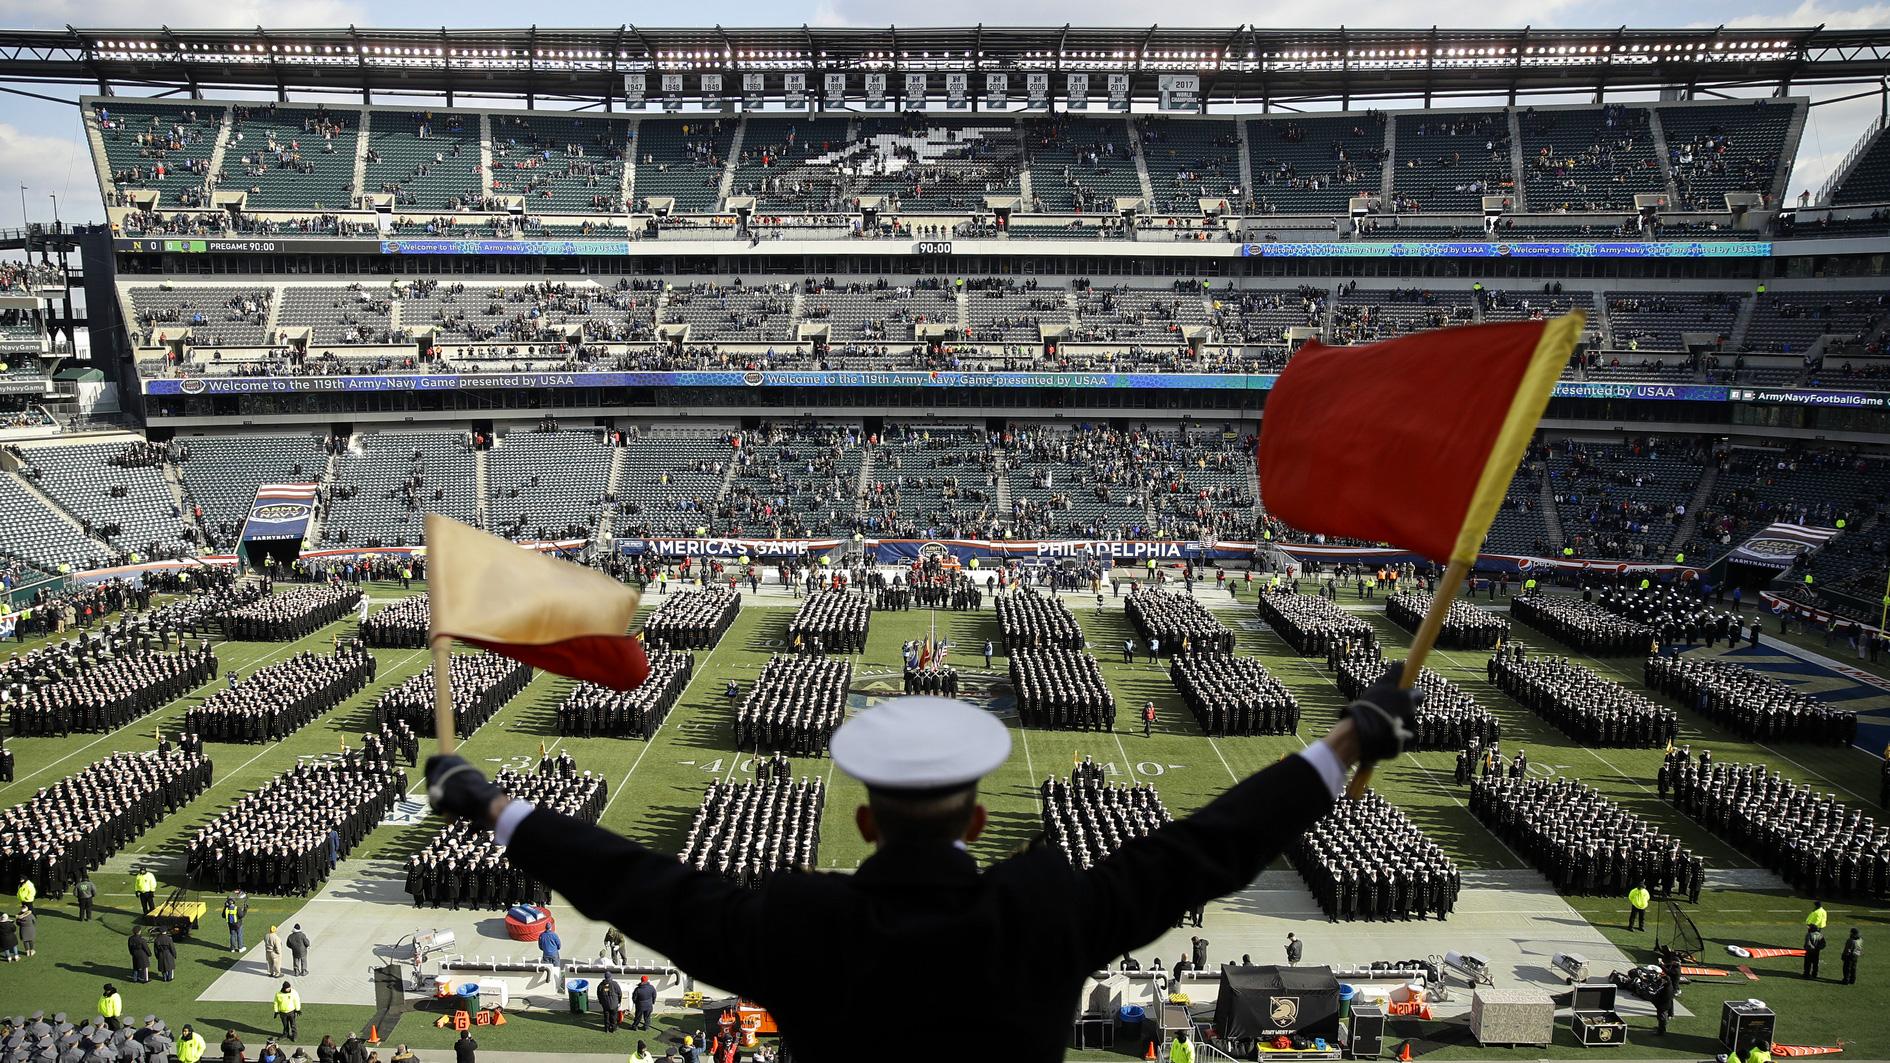 Navy Midshipman Frey Pankratz singles his classmates as they march onto the field ahead of an NCAA college football against the Army, Saturday, Dec. 8, 2018, in Philadelphia. (AP Photo/Matt Rourke)